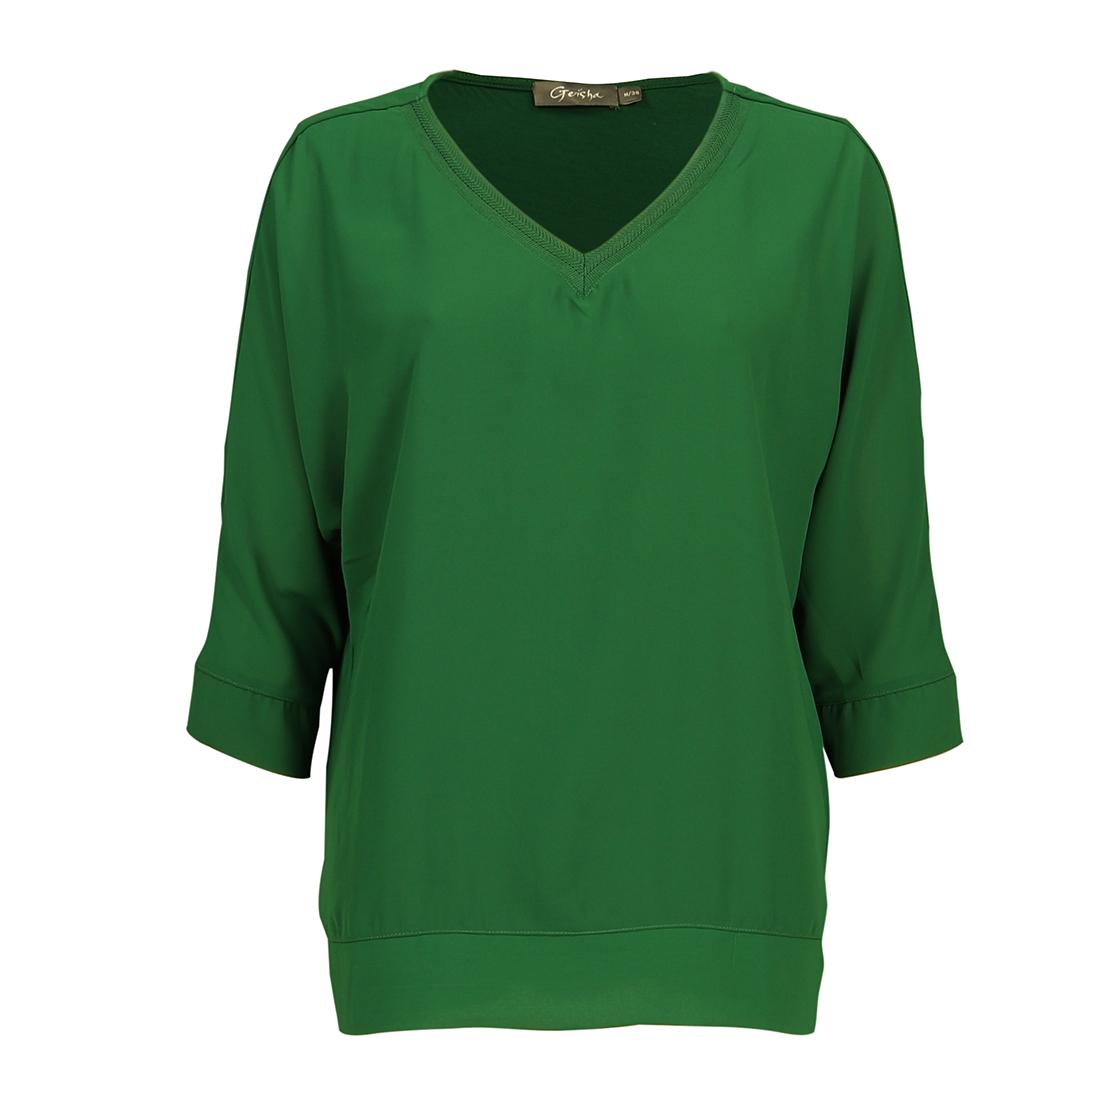 Smit Mode: Geisha blouse 93506 10 in het Donker Groen